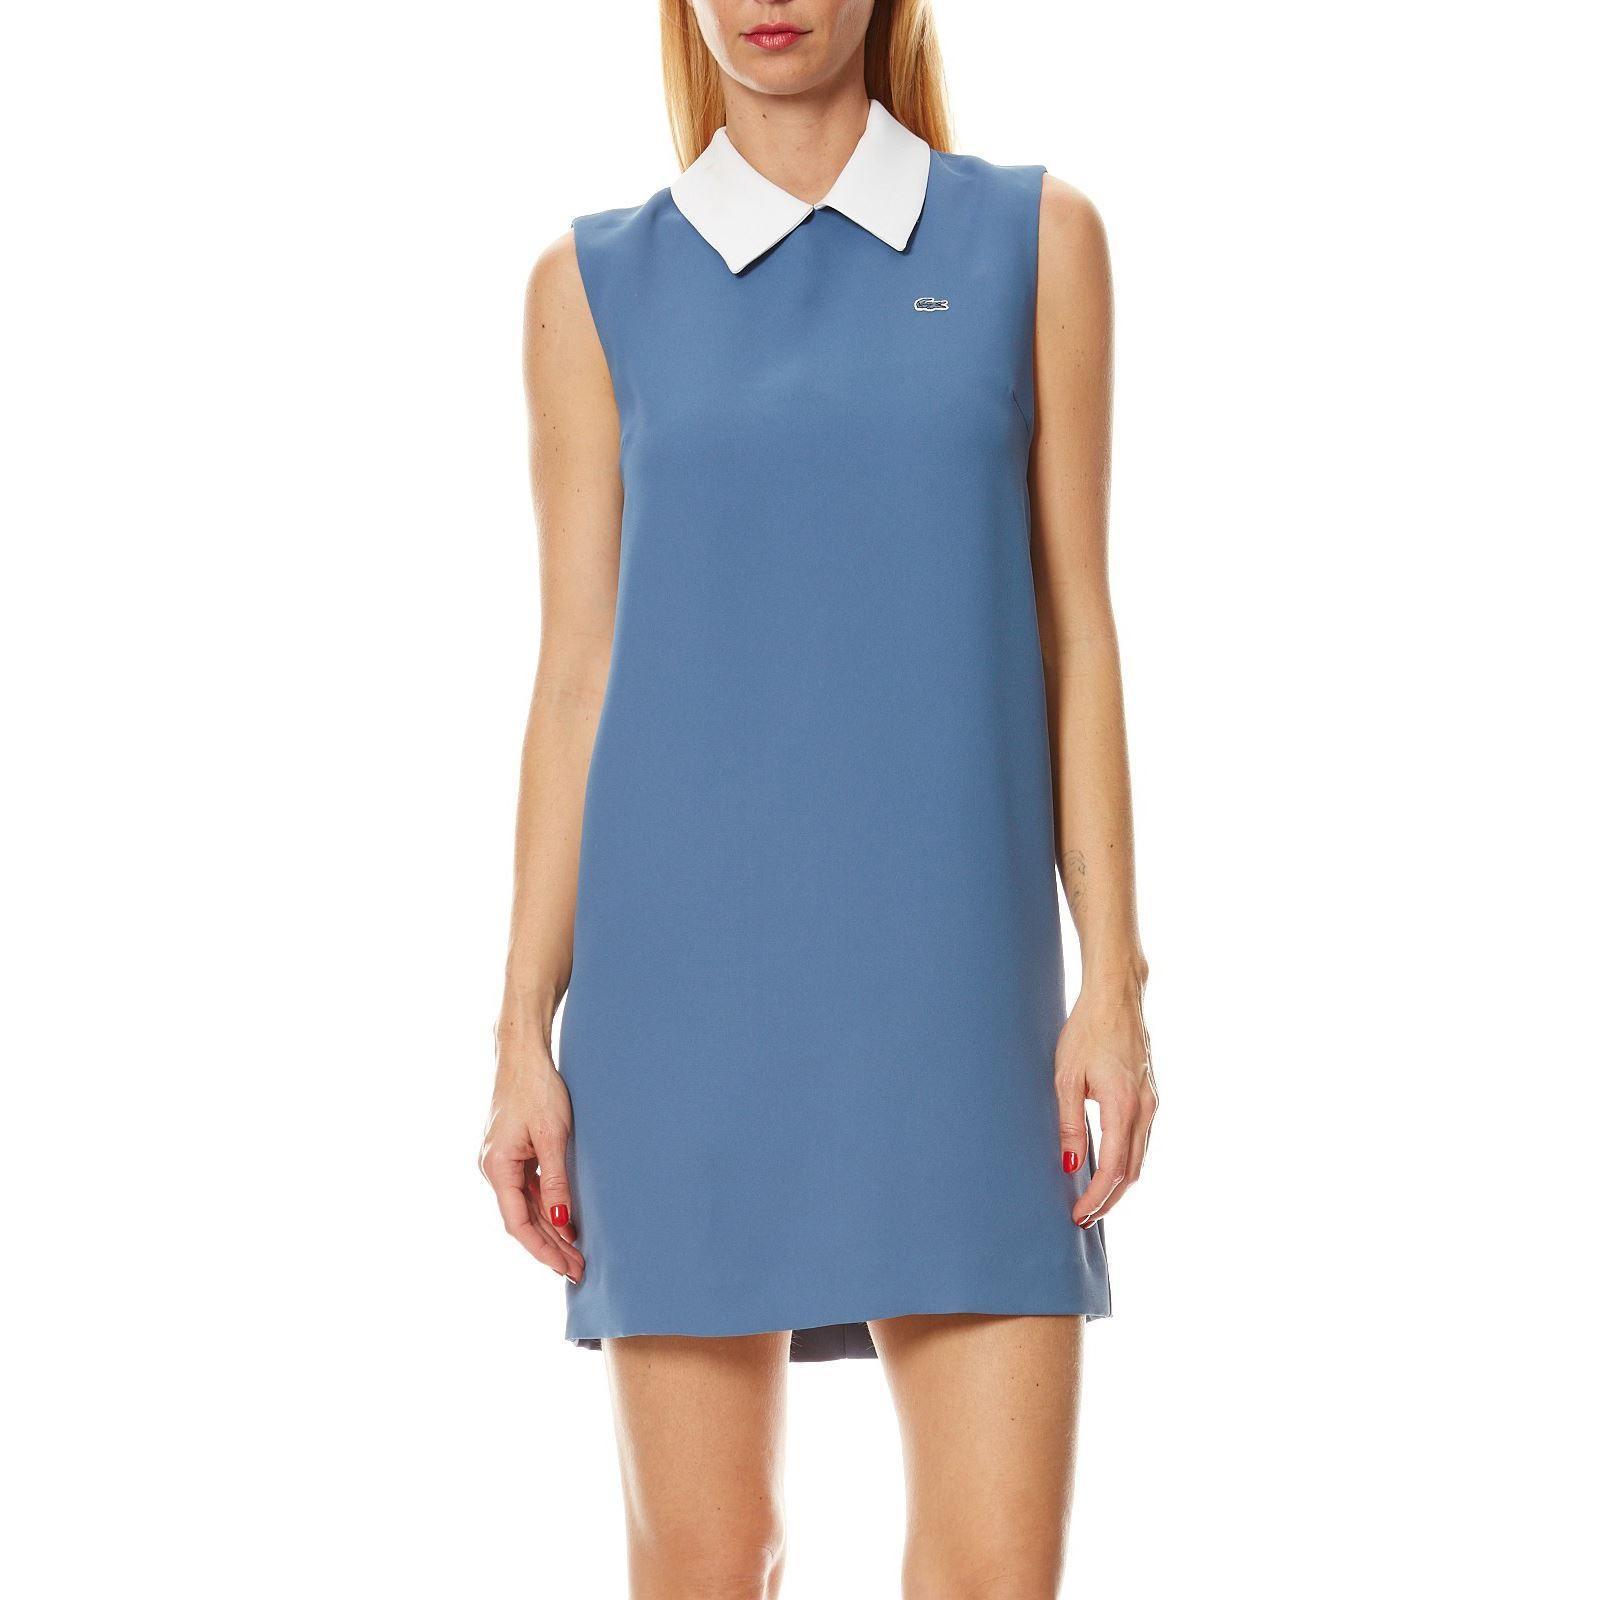 Robe lacoste bleu